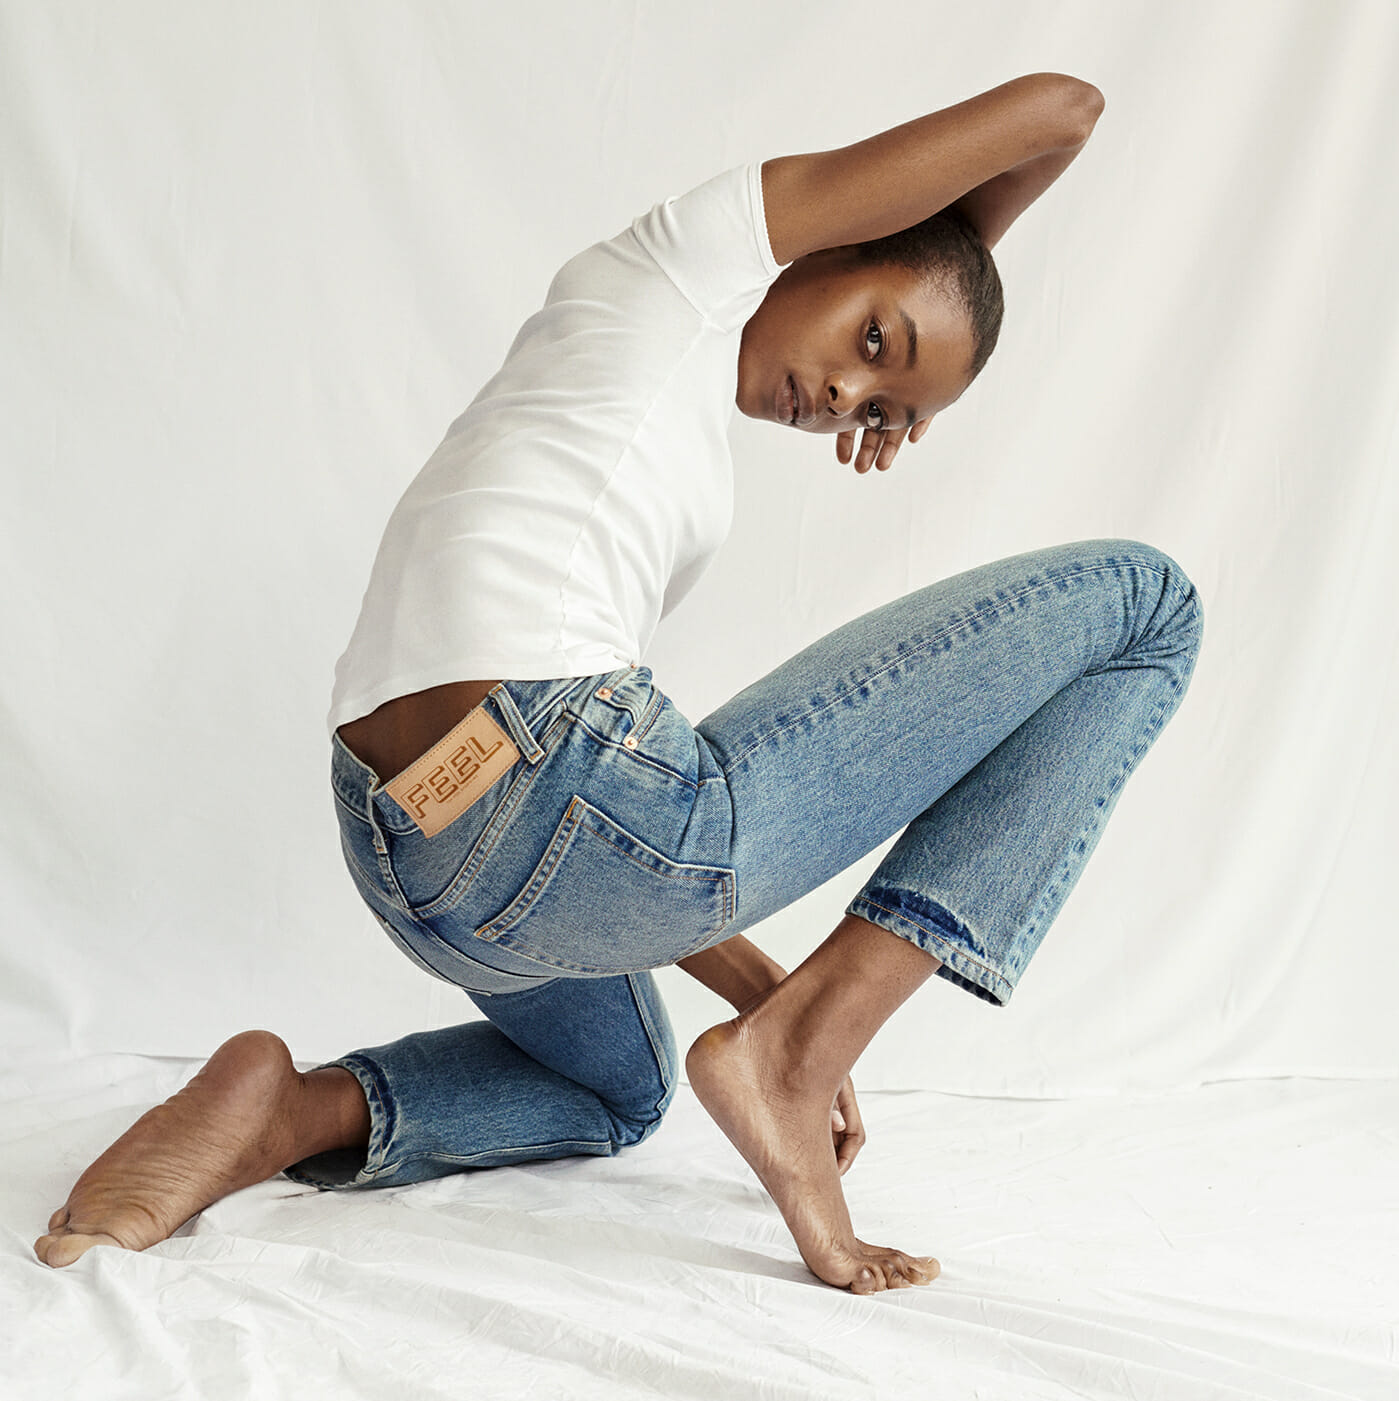 Feel-Jeans-and-Small-Brands-Stevie-Dance-for-FEEL-jeans-Man-Repeller-January-2019-2-of-2-copy-2.jpg